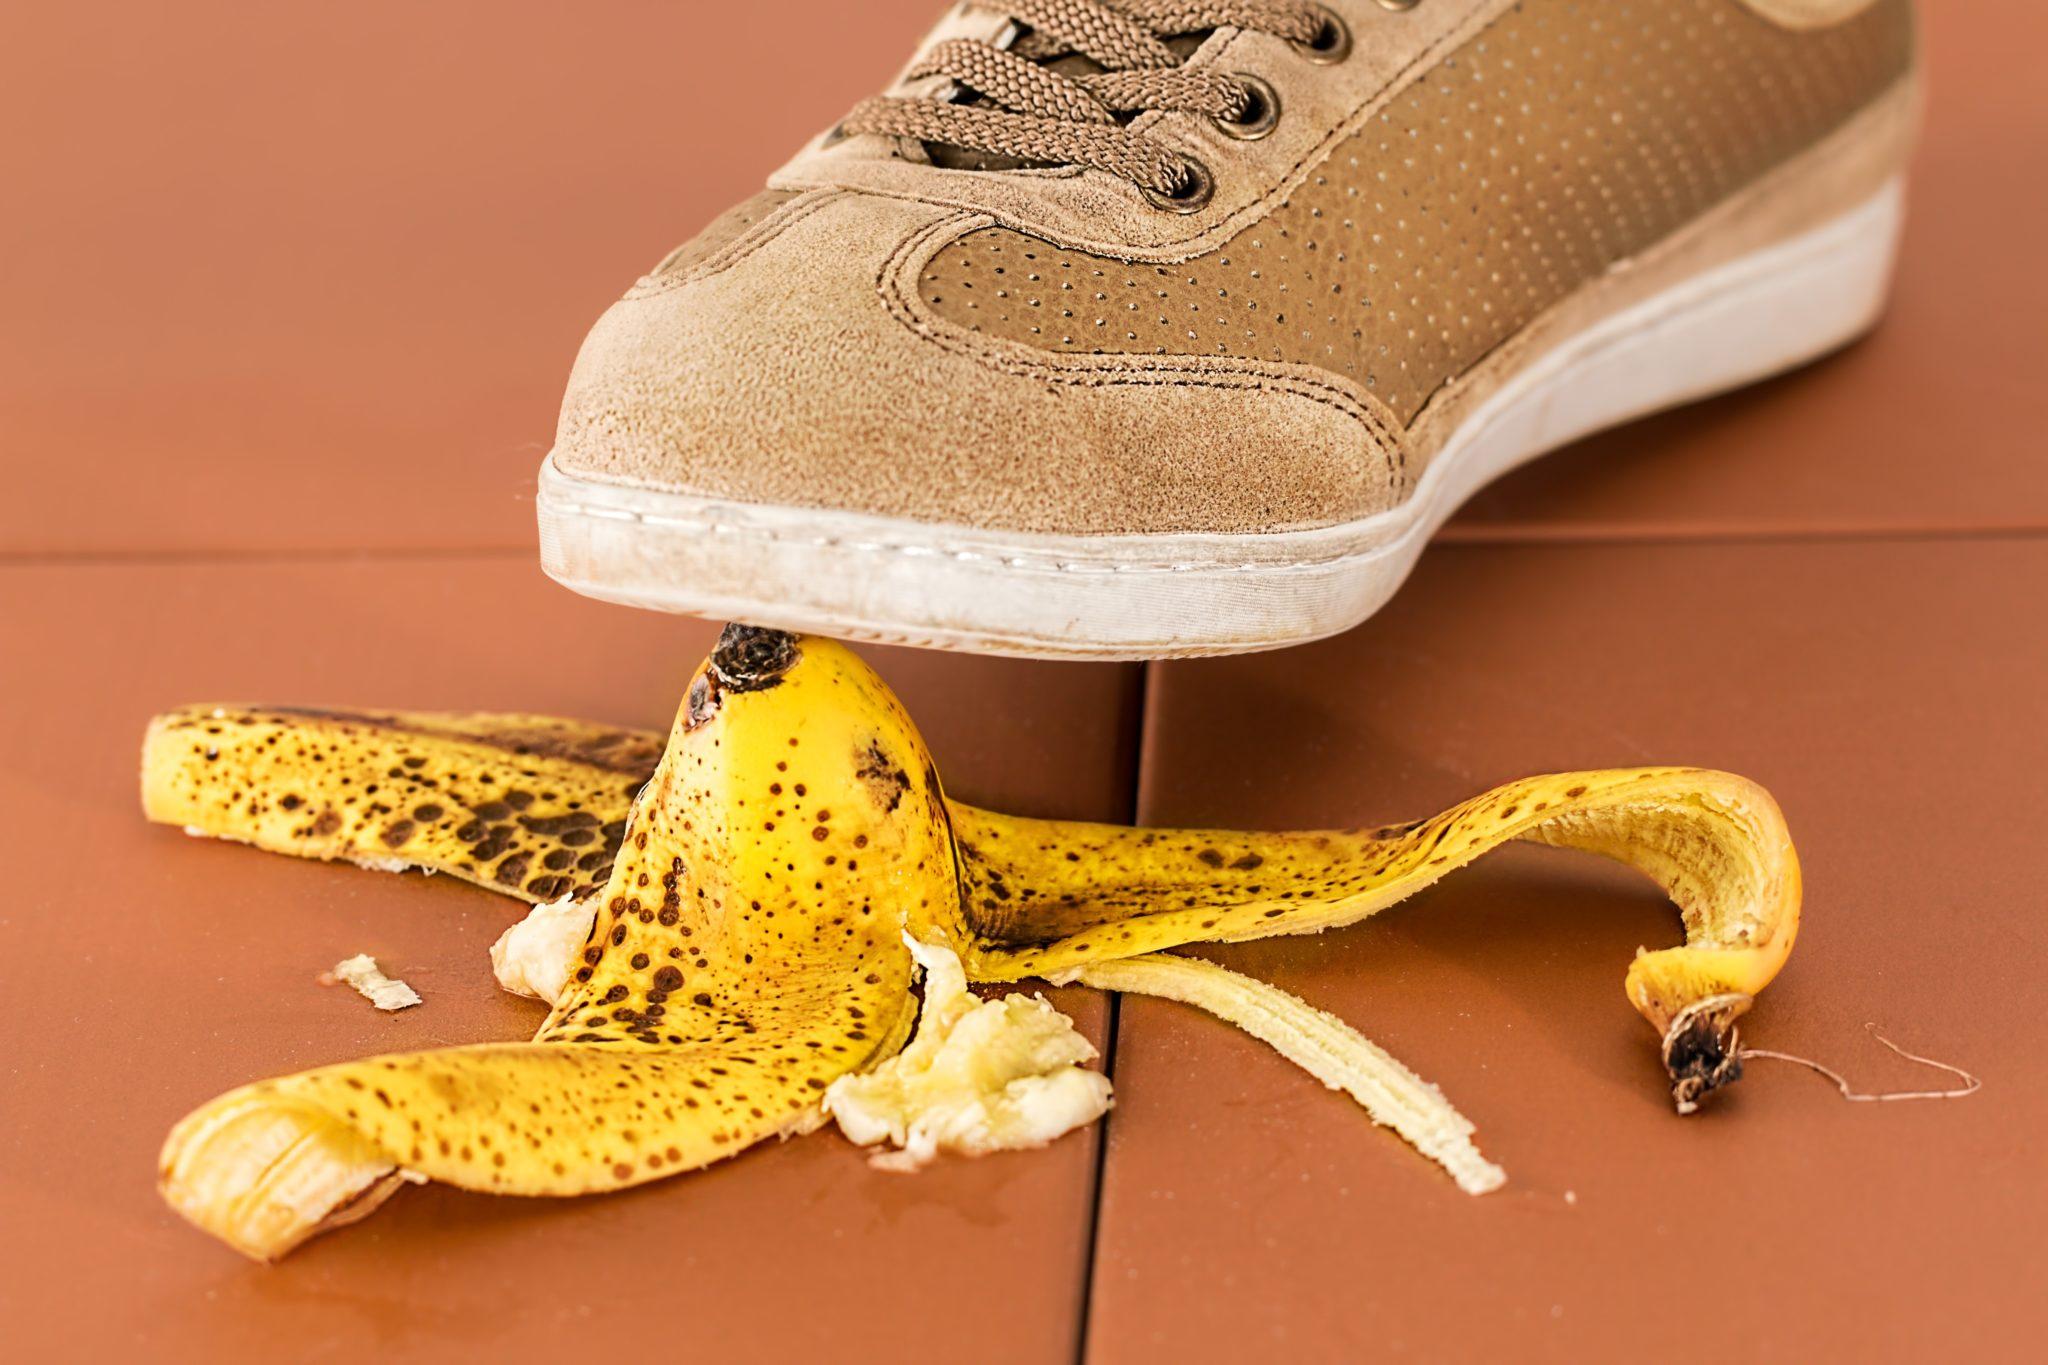 SEO Banana Skin # 2 – Ignoring Mobile Users